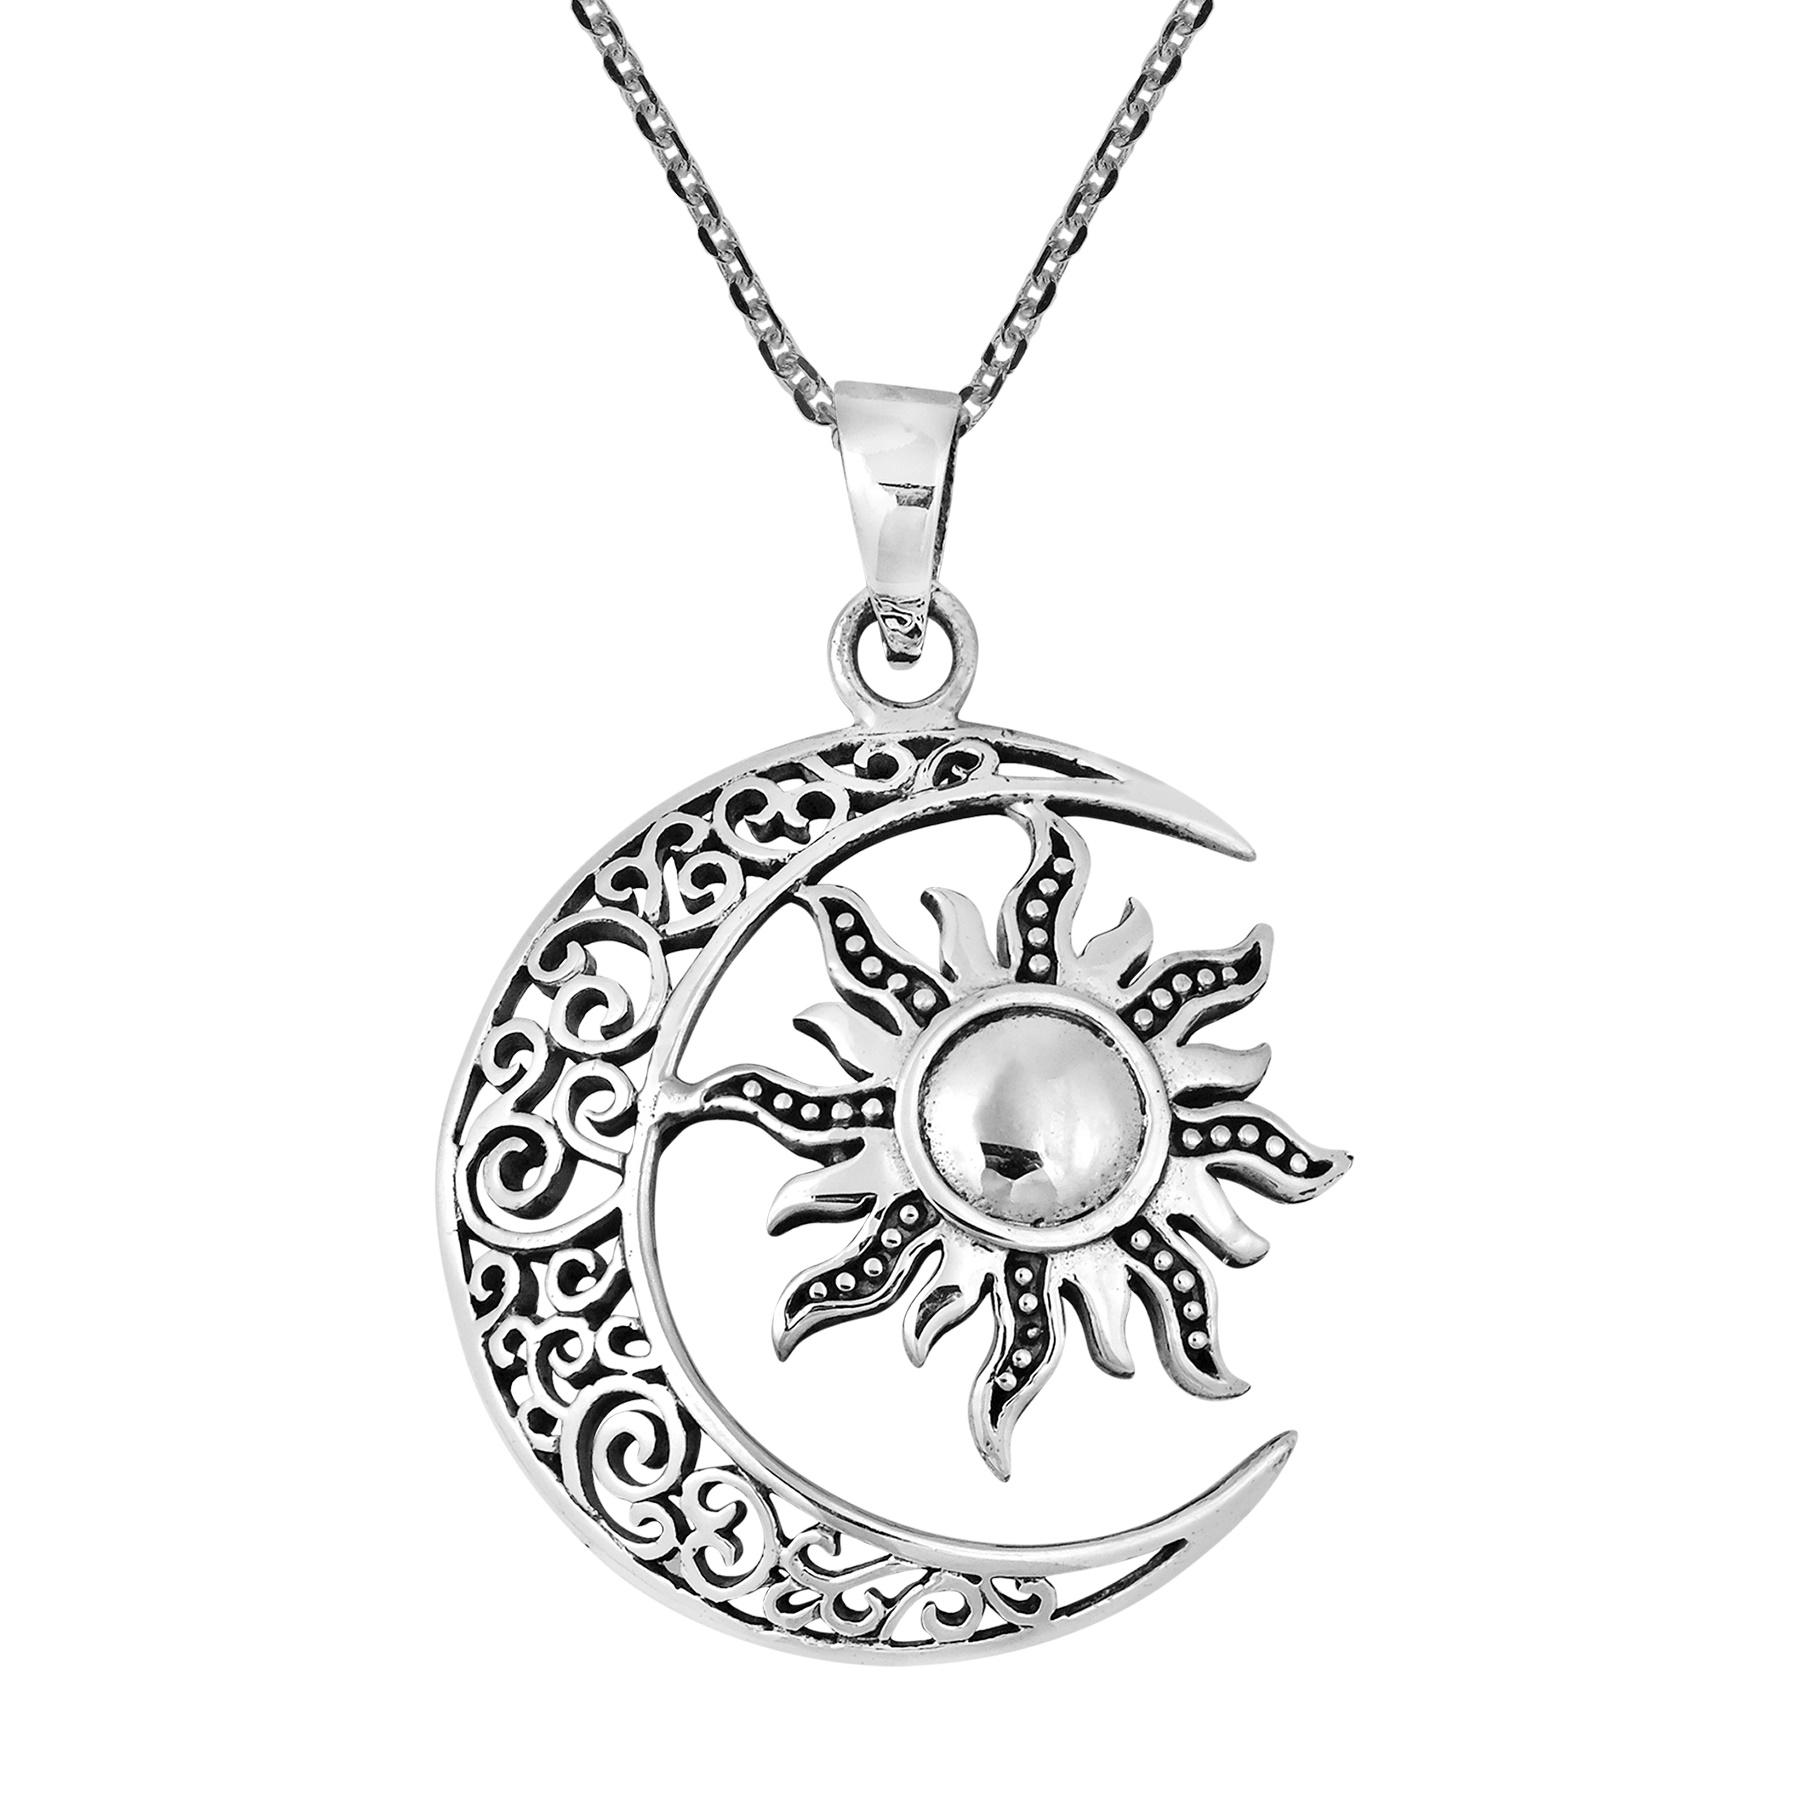 1804x1804 Drawn Sunshine Crescent Moon